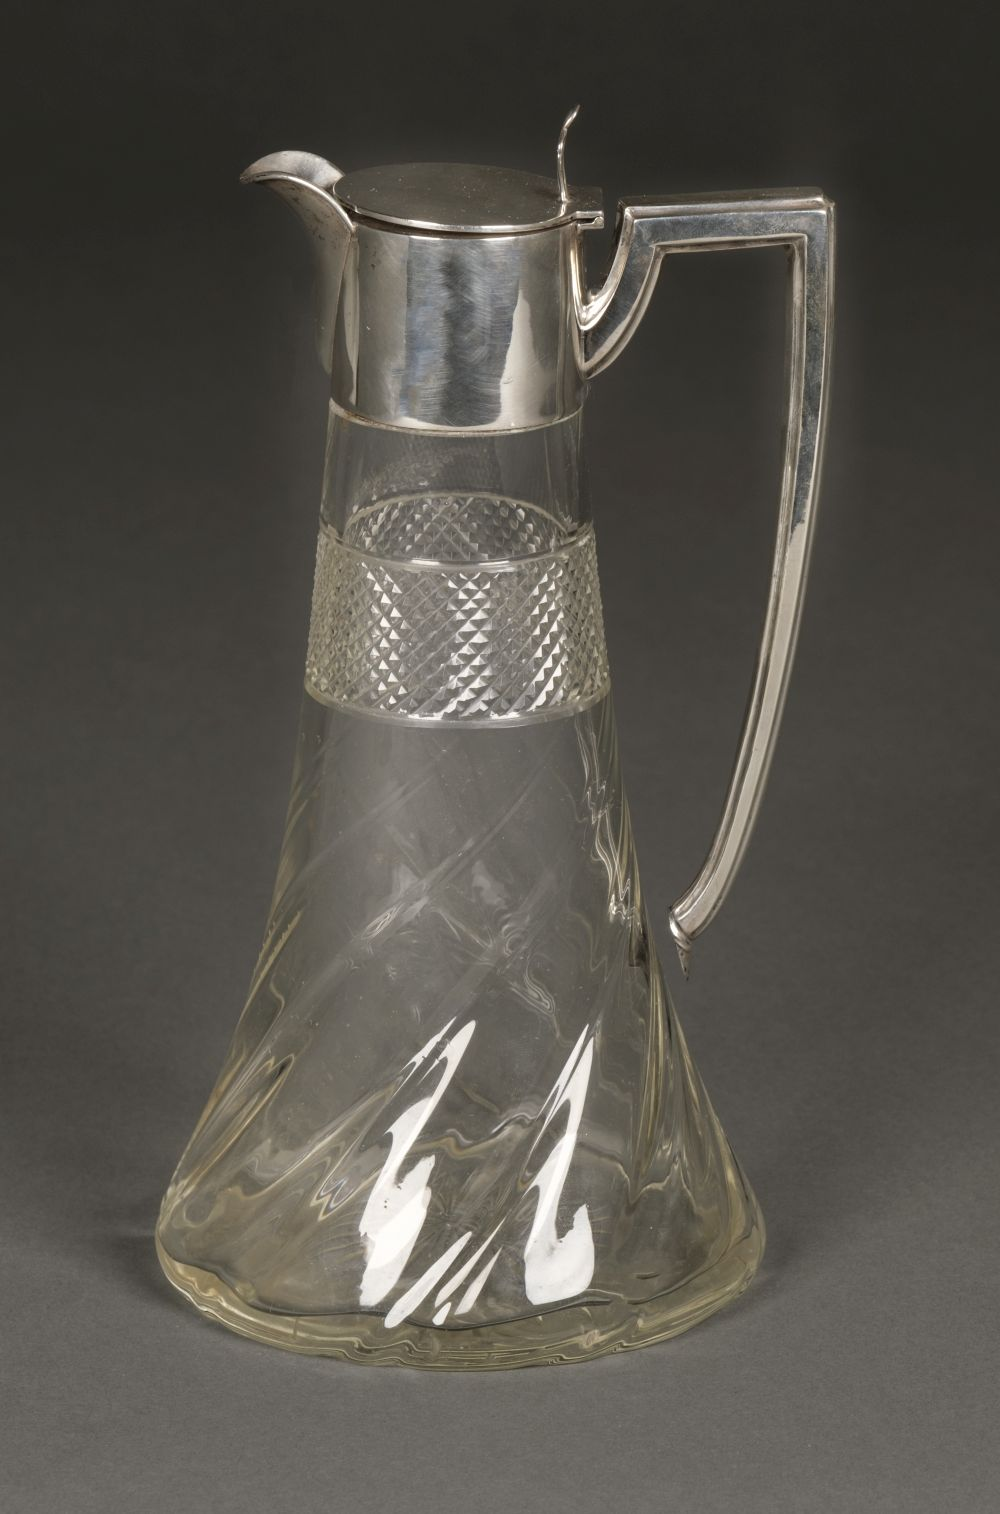 * Claret Jug. Silver top claret jug by Walker & Hall, Sheffield, 1909